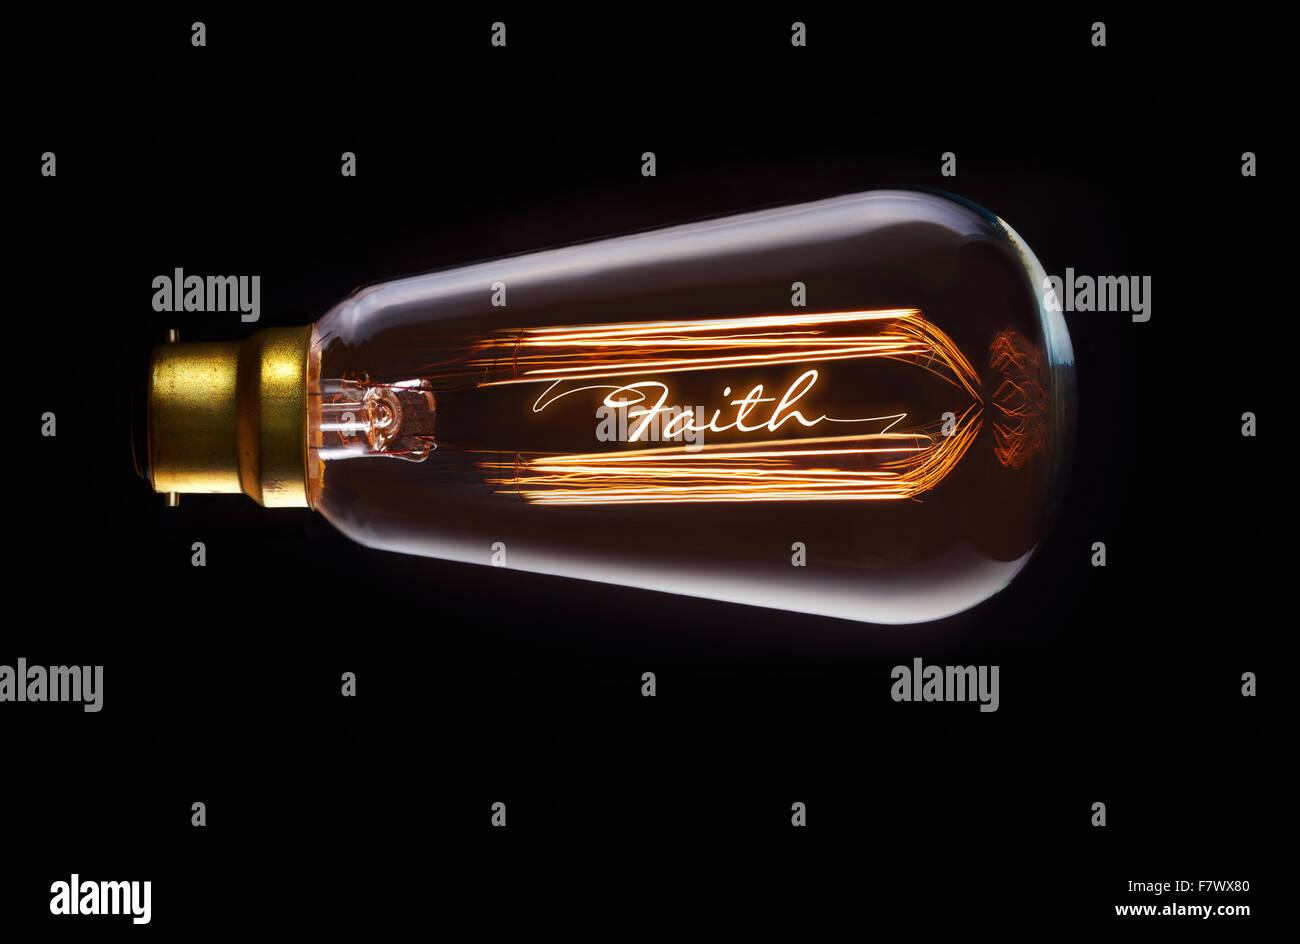 Religion, Faith concept in a filament lightbulb. - Stock Image